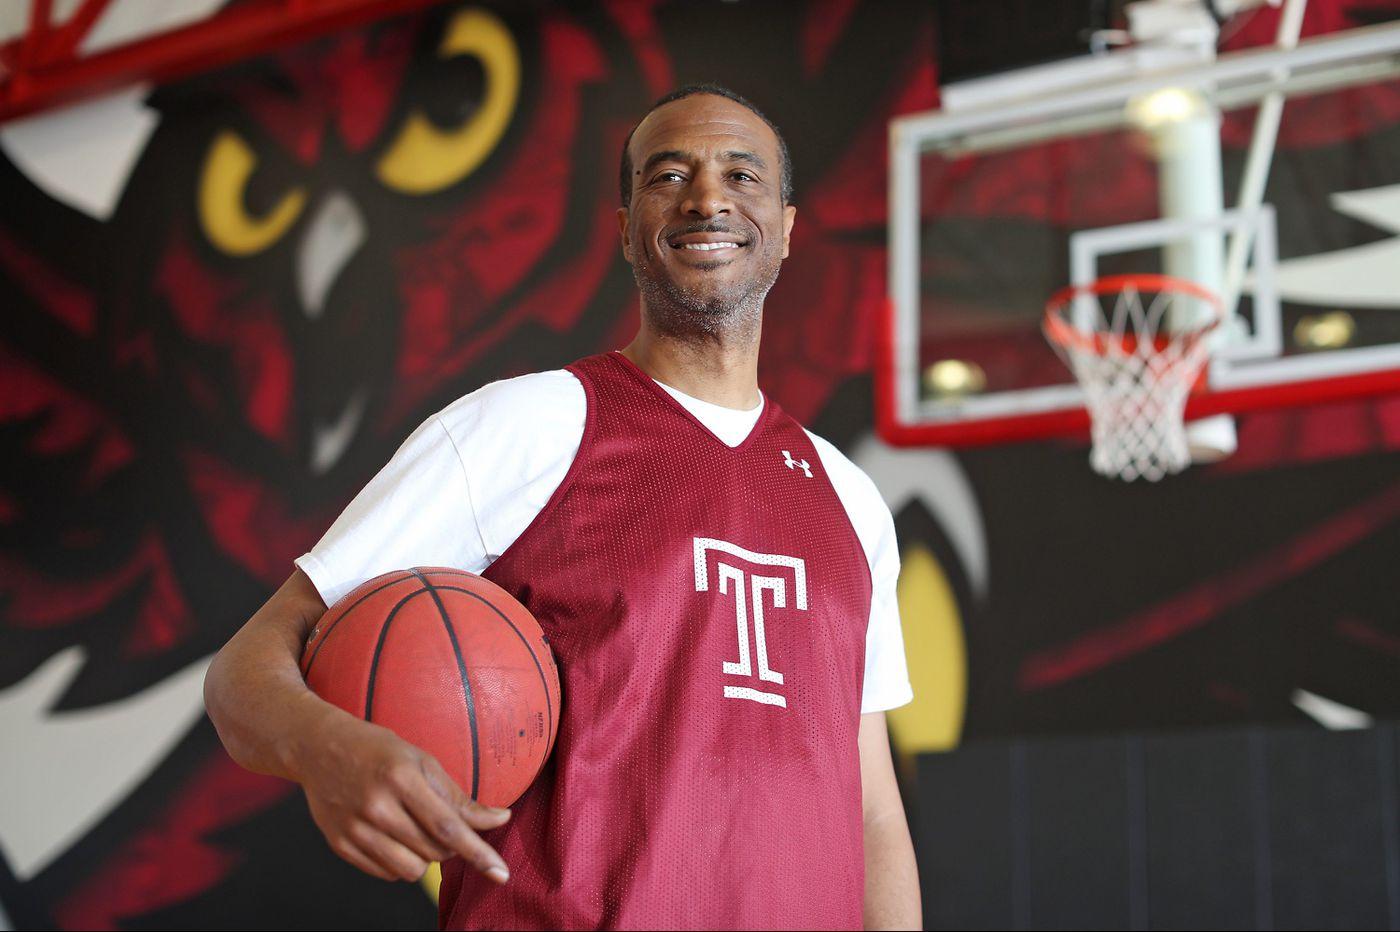 Girard College awaits word on basketball coach Mik Kilgore after he suffers heart attack